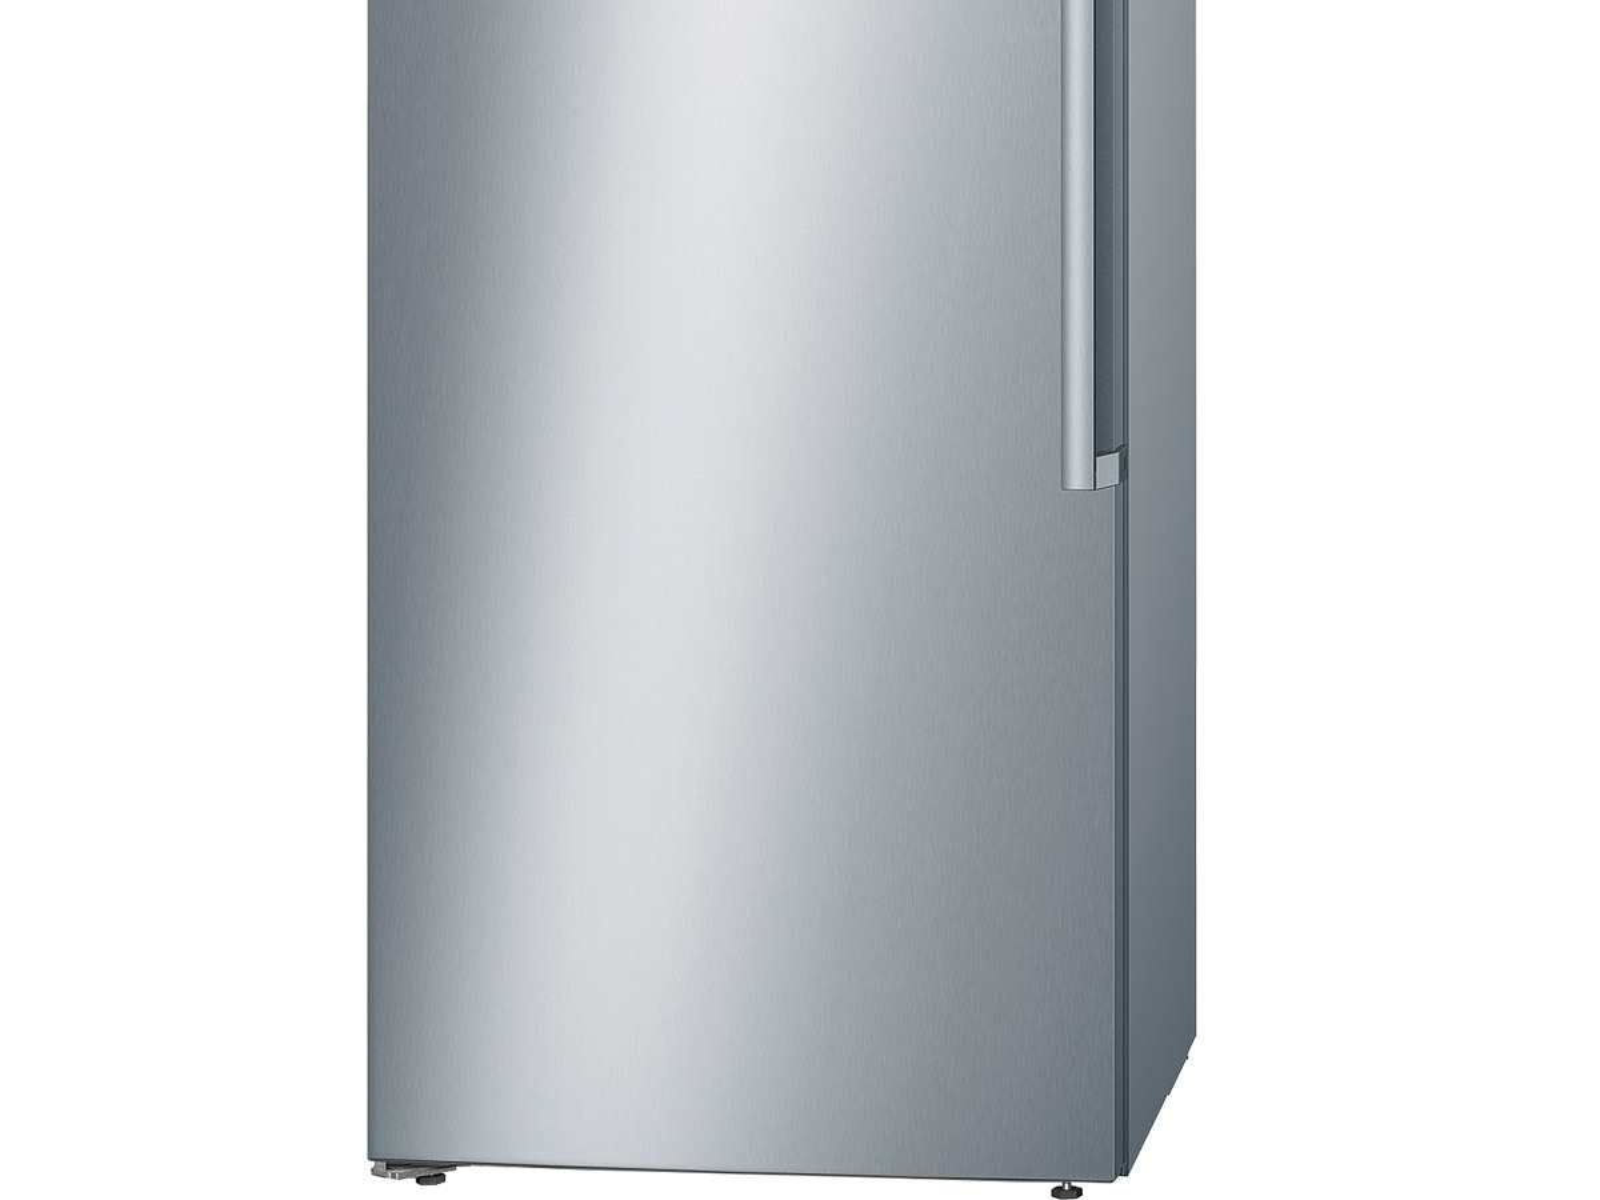 Gorenje R6193lx Kühlschrank : 30 elegante standkühlschrank edelstahl küchen ideen